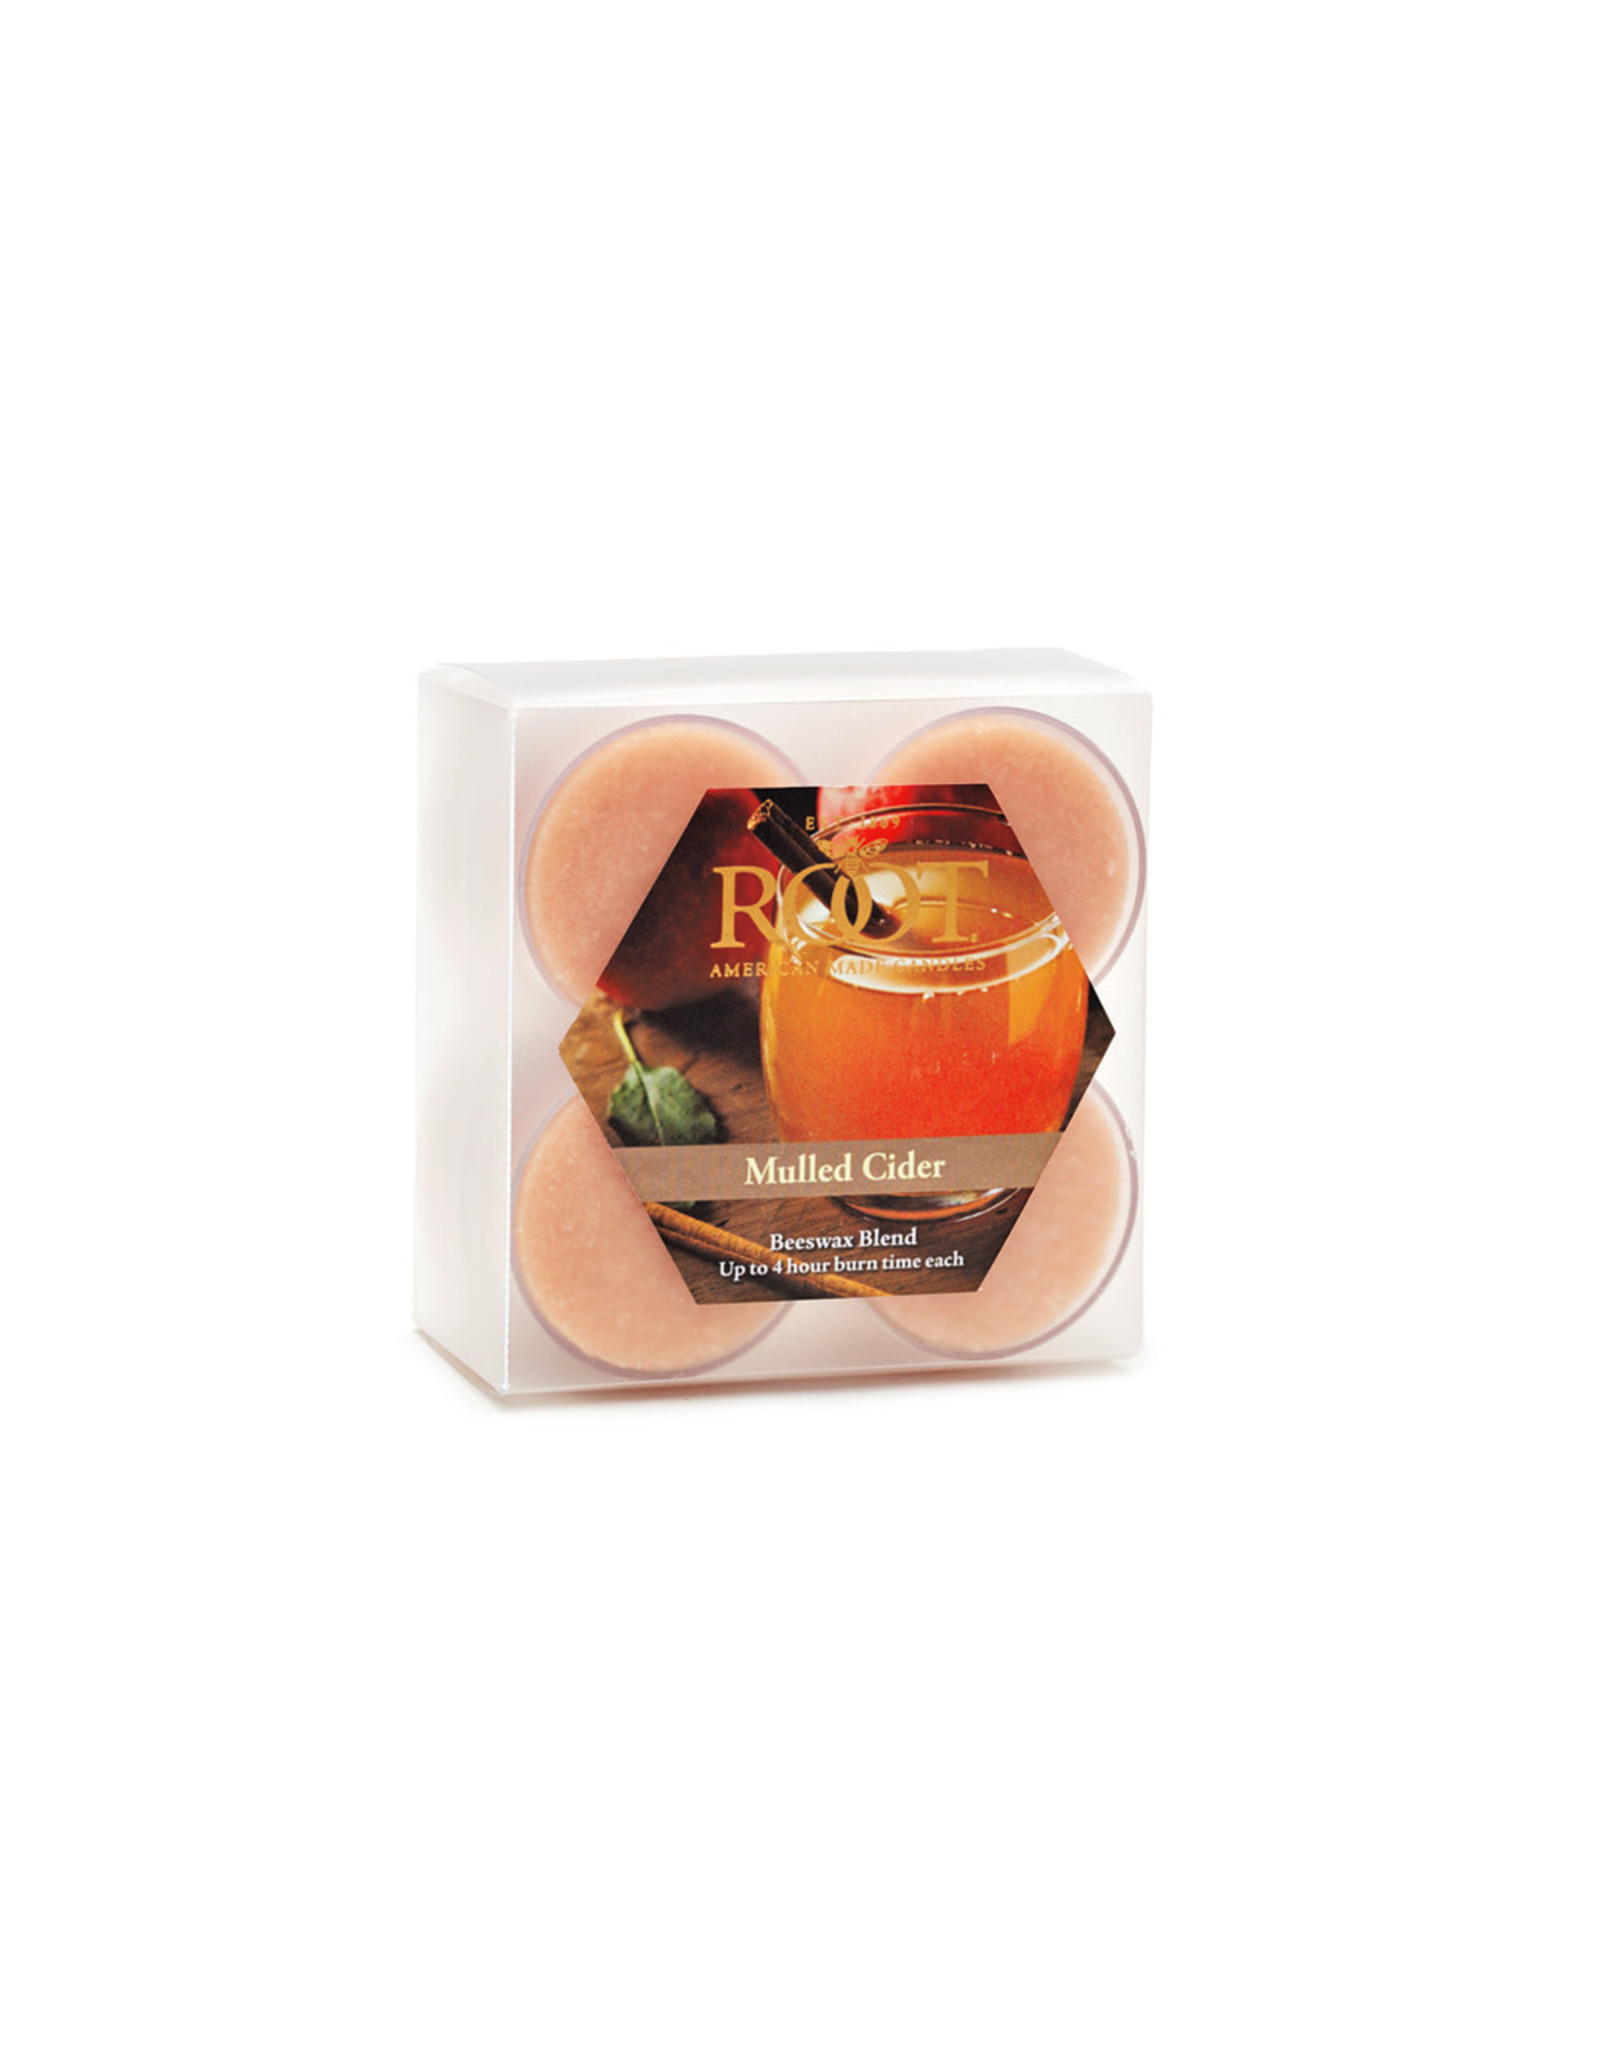 Beeswax Blend Tea Light Set of 8 Candles - Mulled Cider